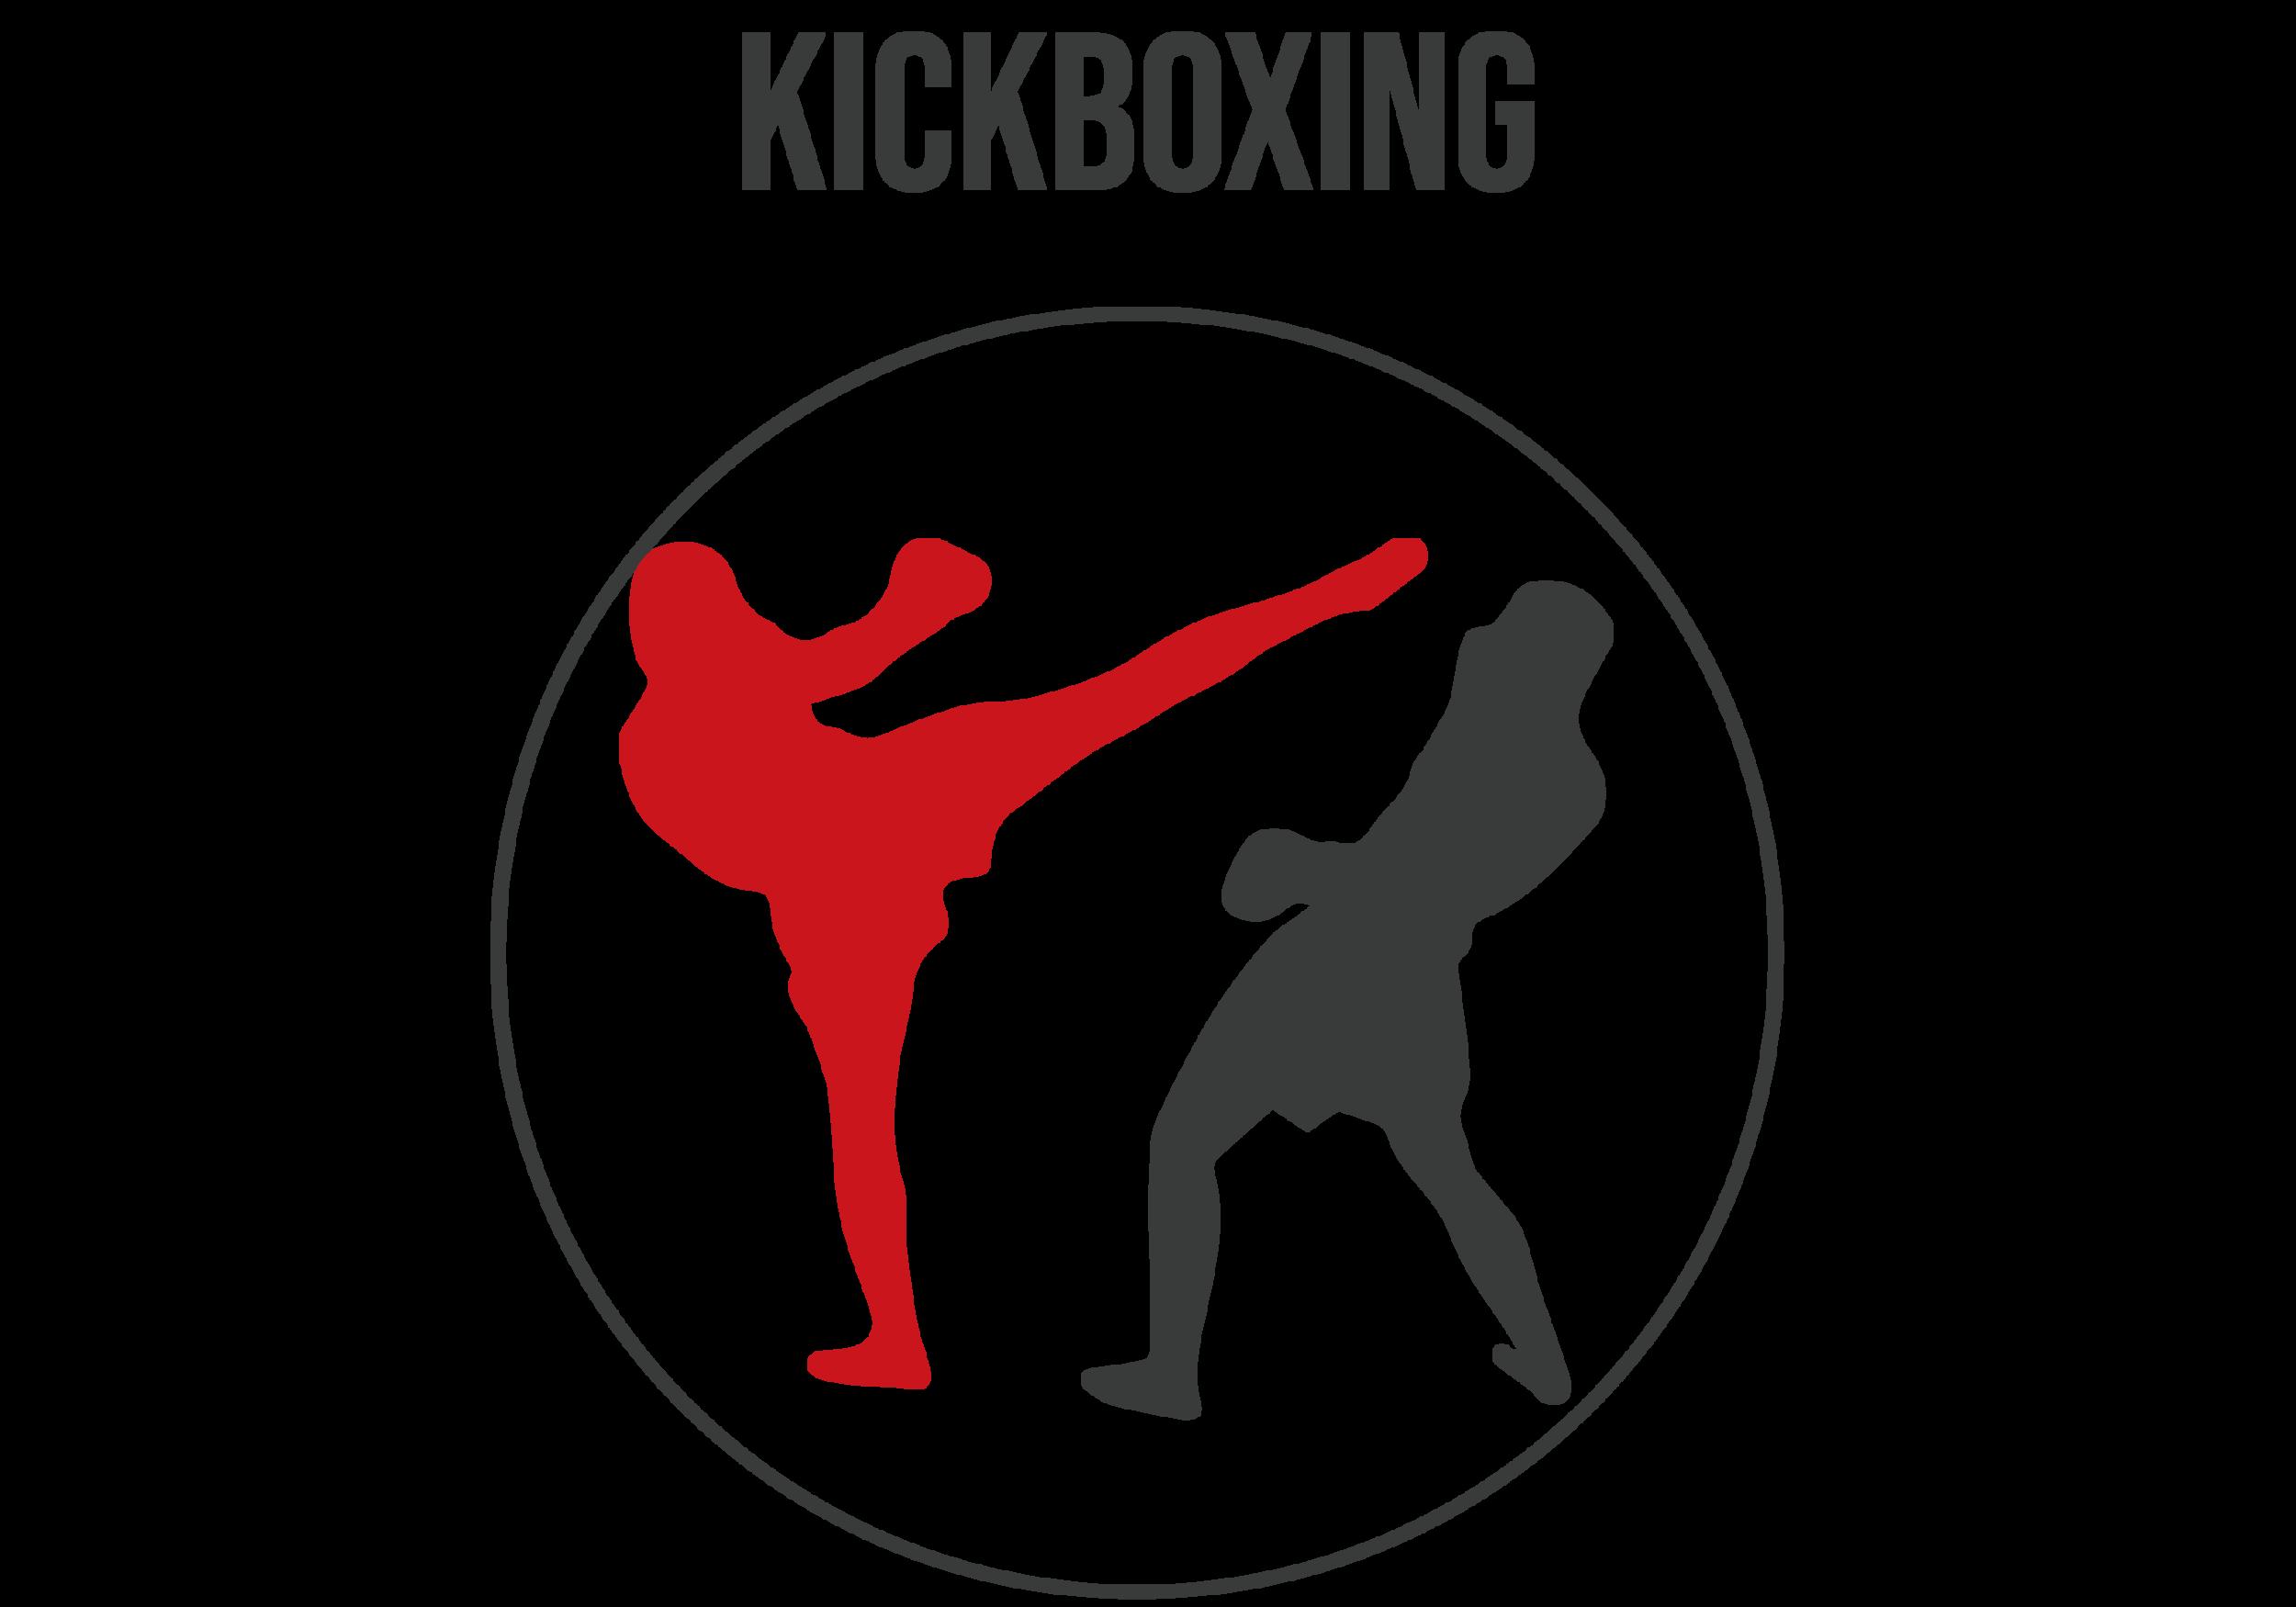 Copy of Kickboxing